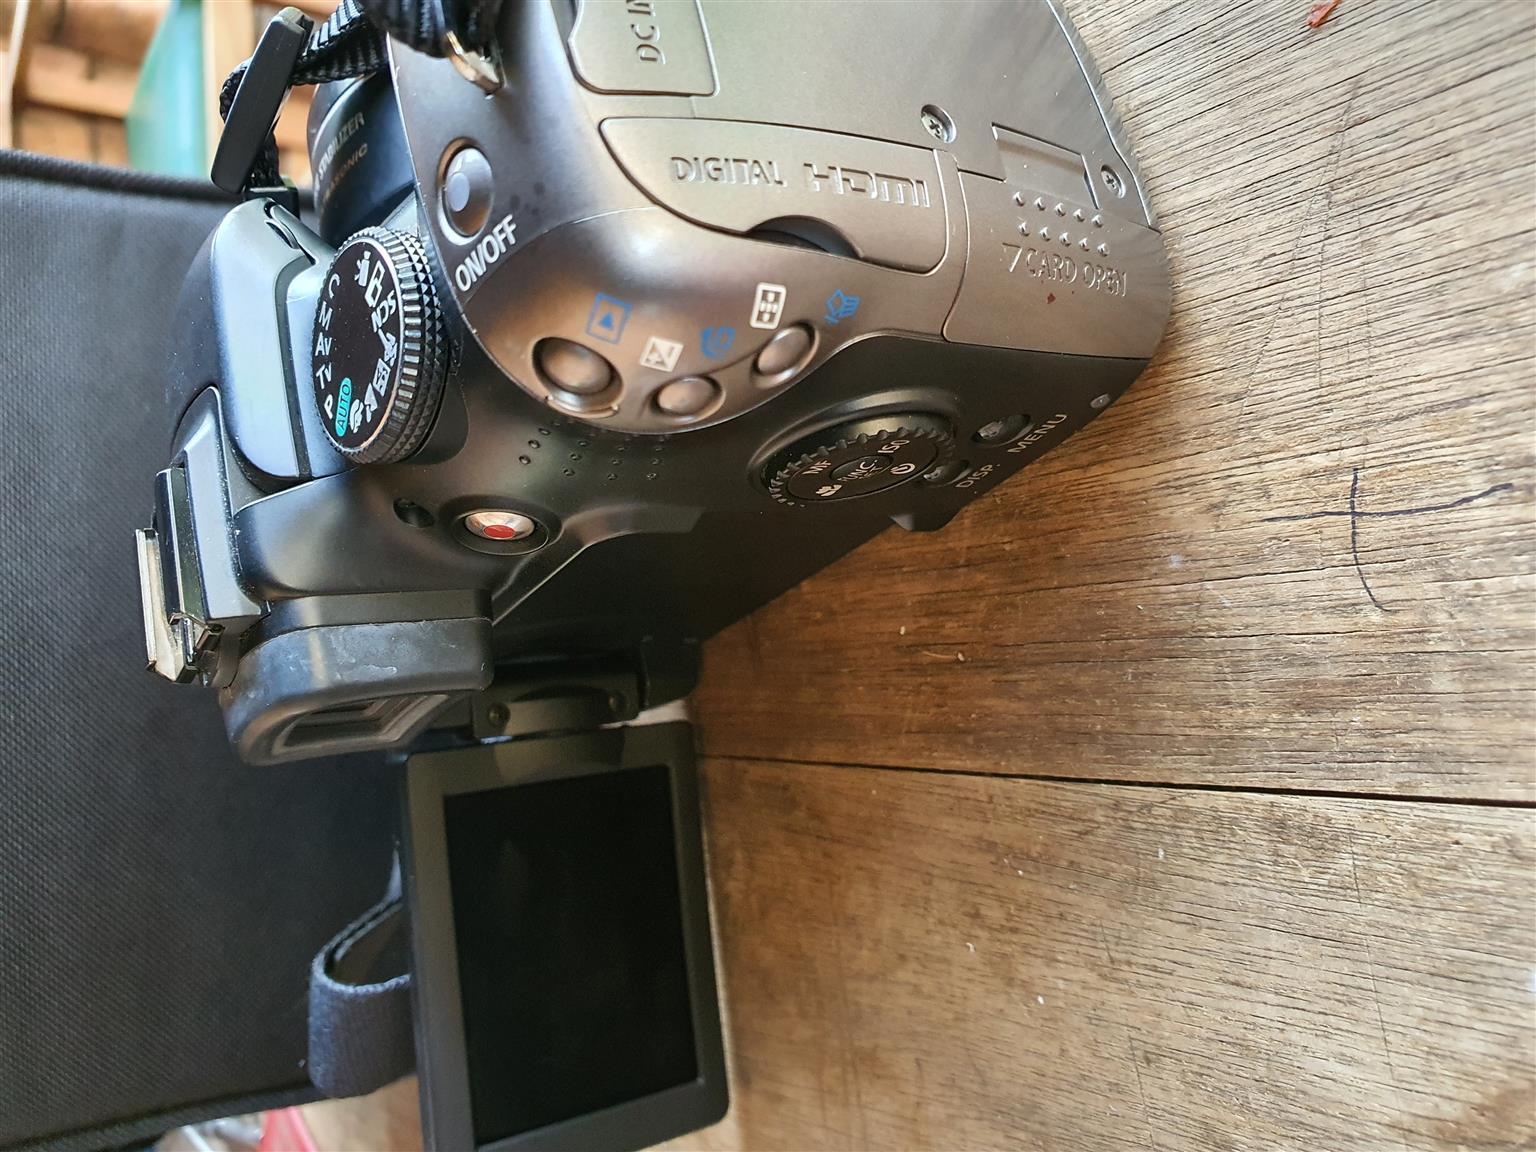 Canon SX20 IS 12.1 mega pixels